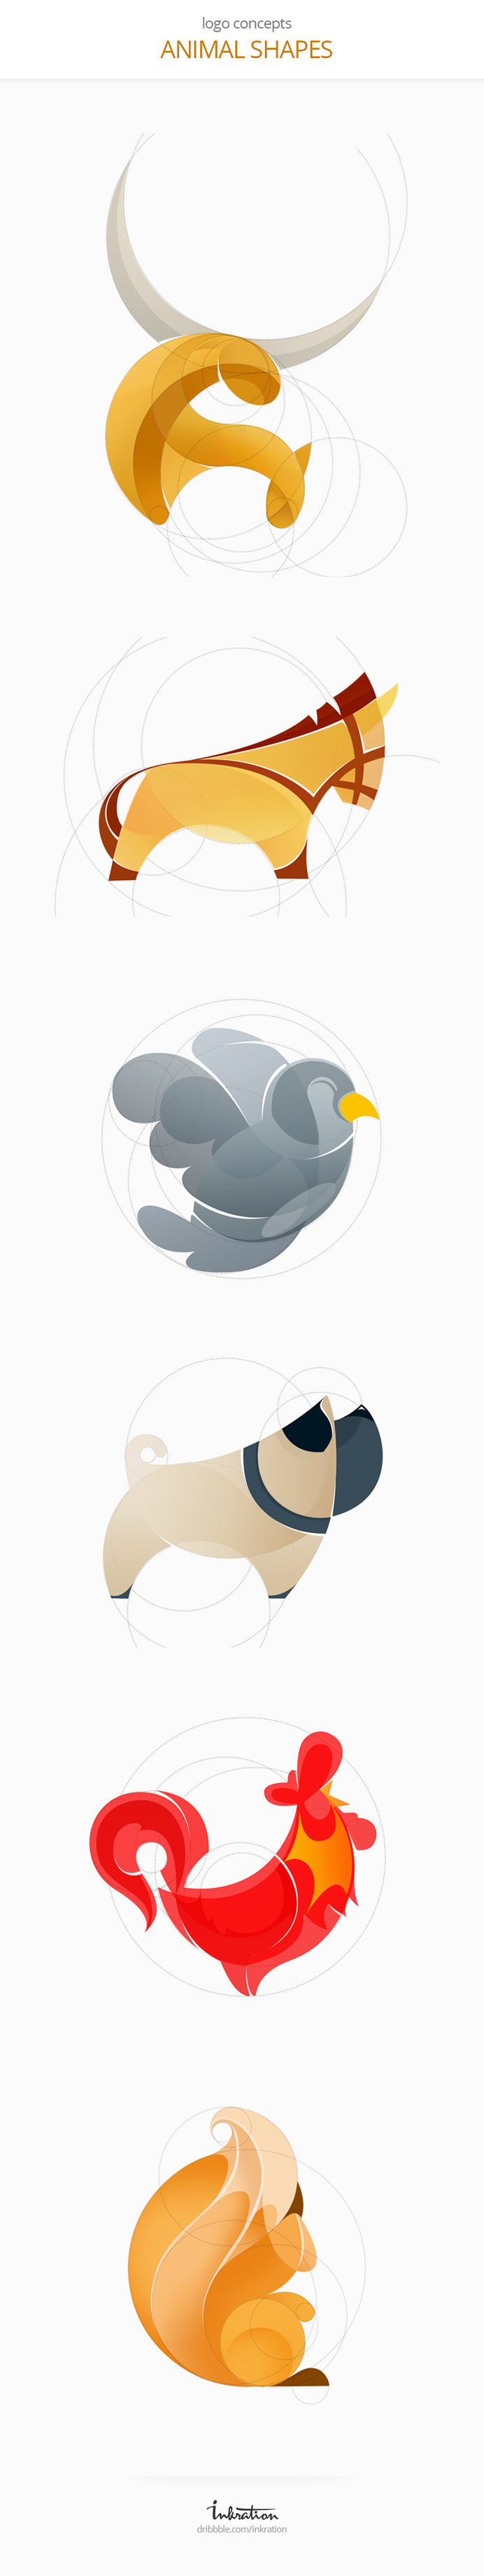 Animal Logos by Ink Ration #vector #process #design #logo #animal #sketch